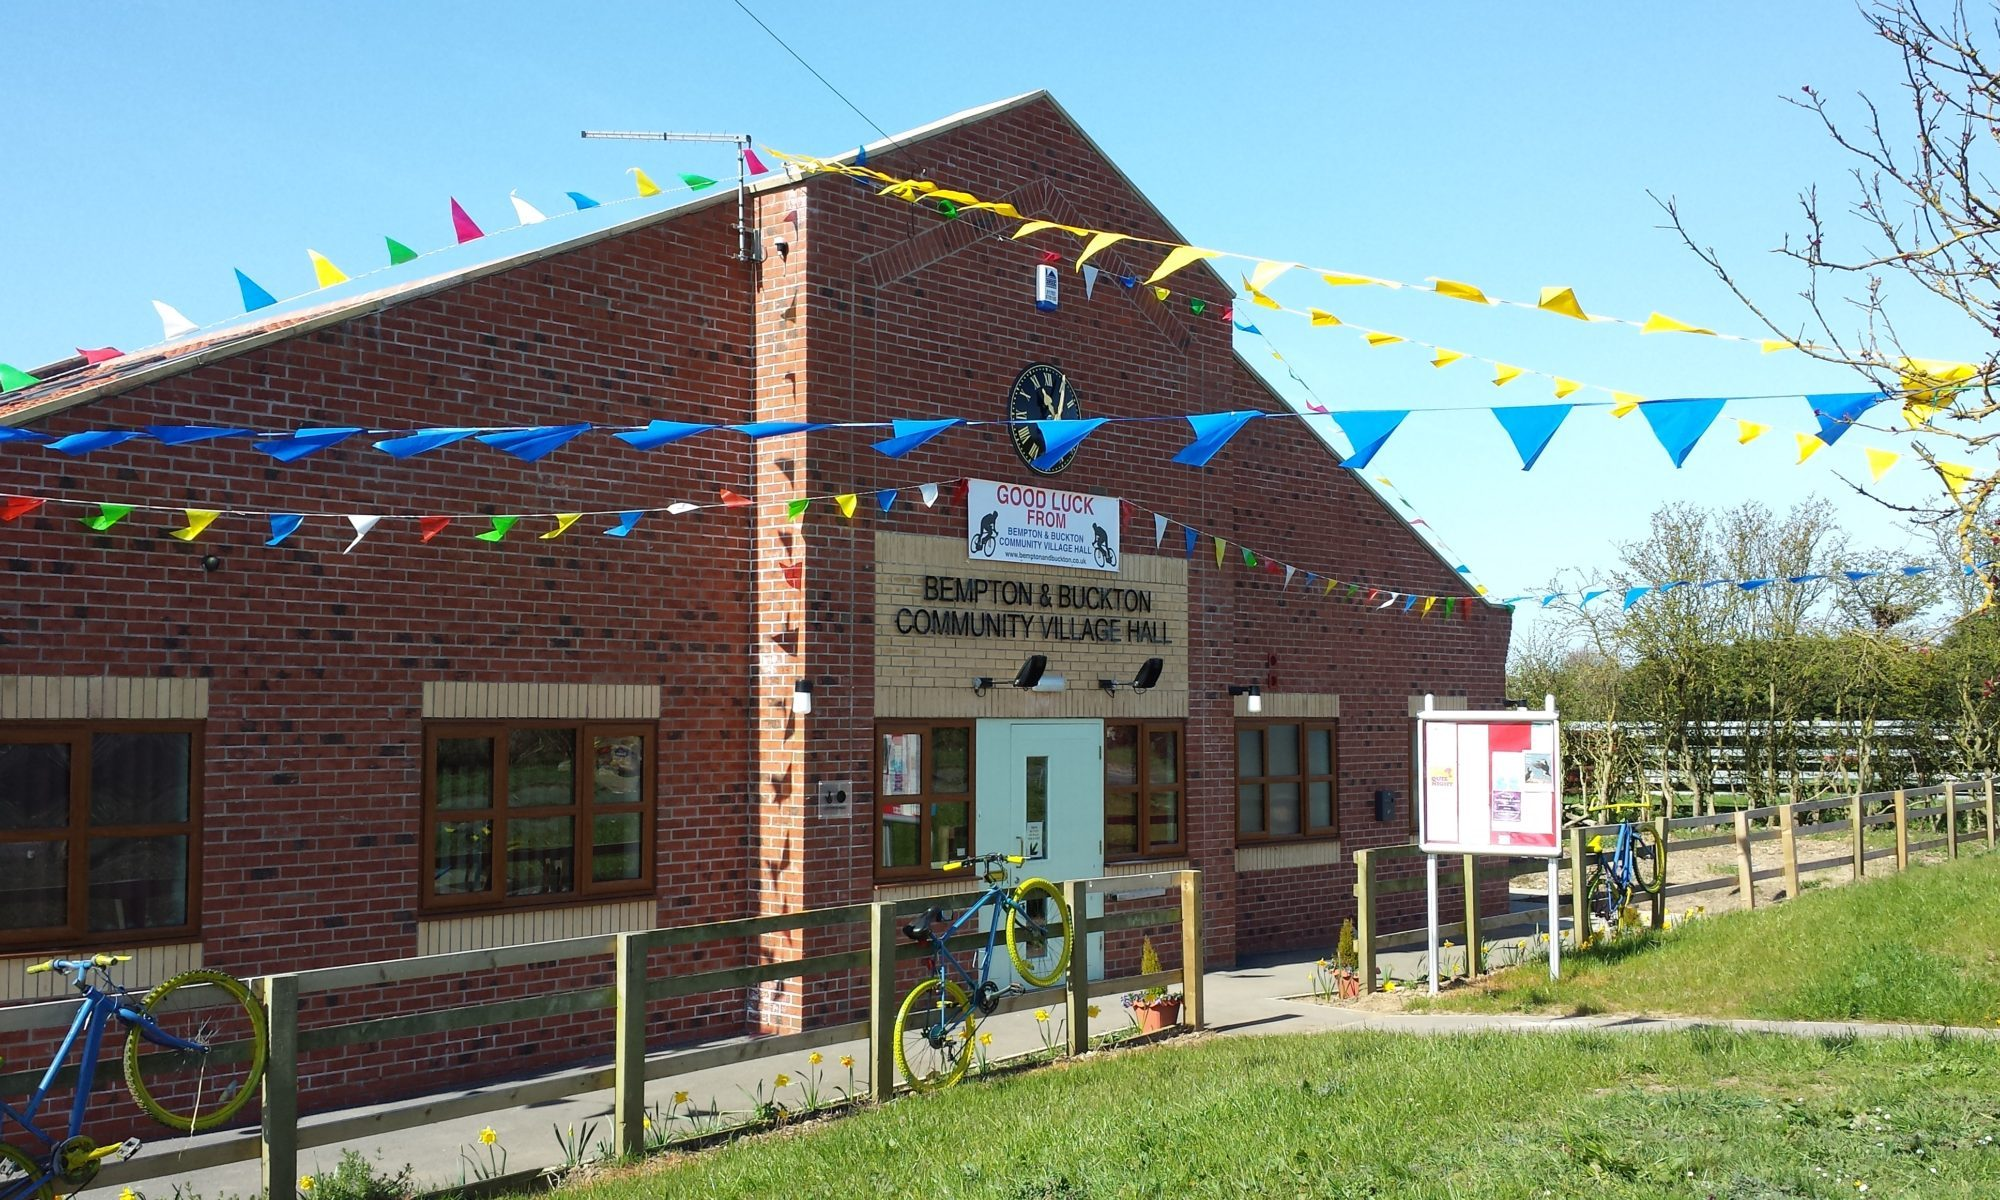 Bempton & Buckton Community Village Hall